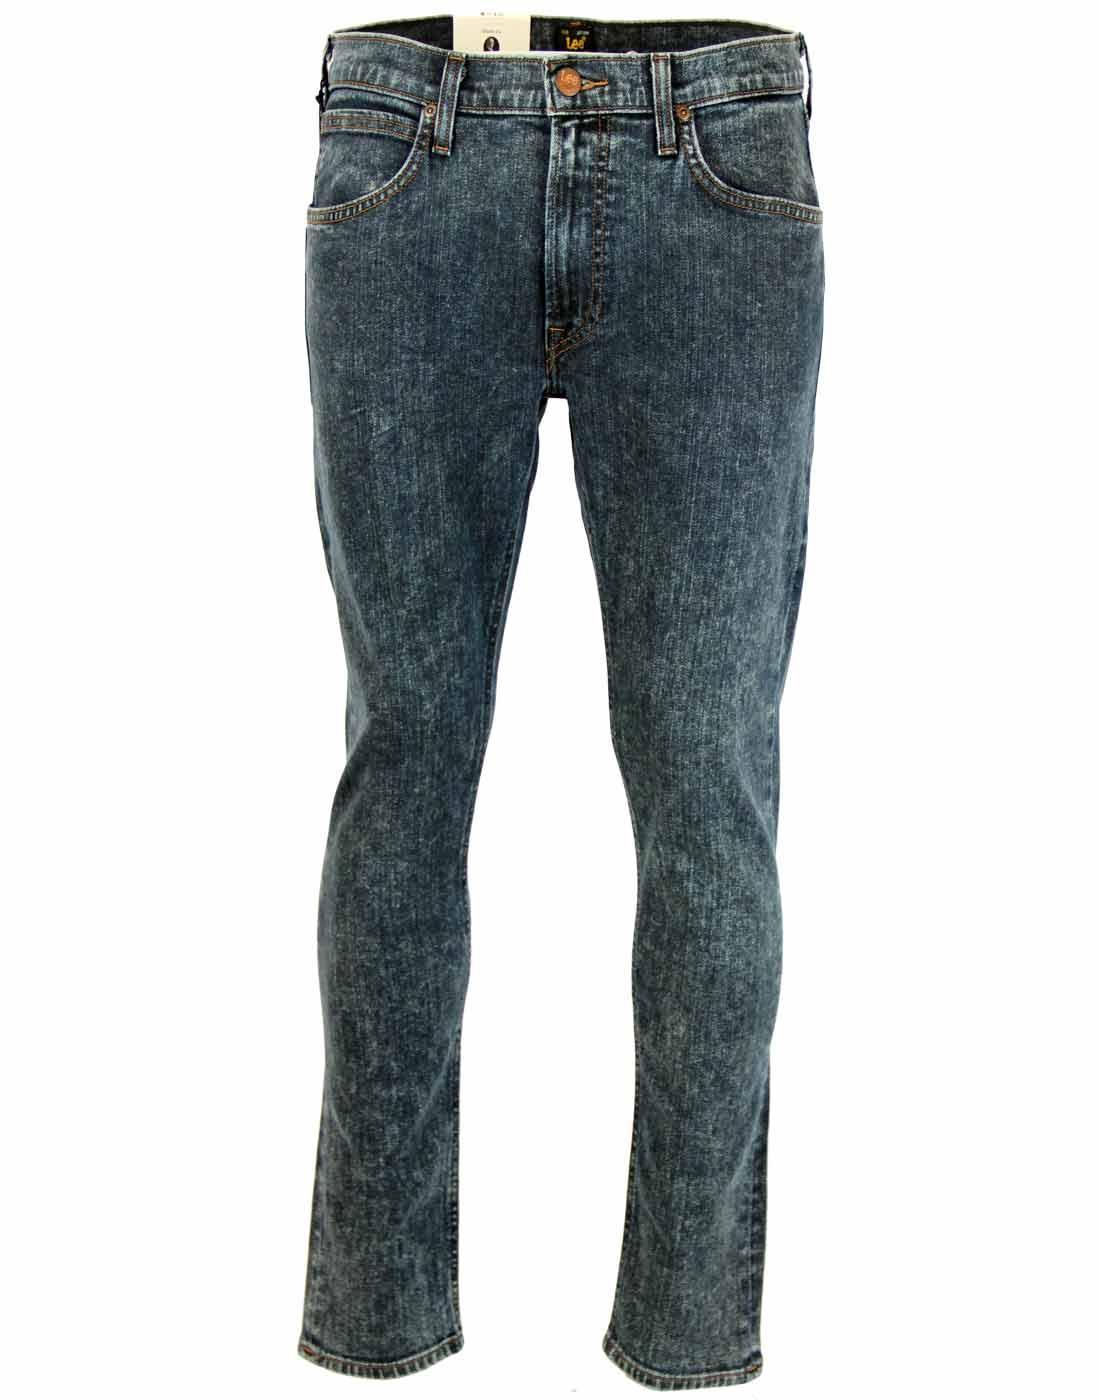 Luke LEE JEANS Retro 90s Worn Slim Tapered Jeans